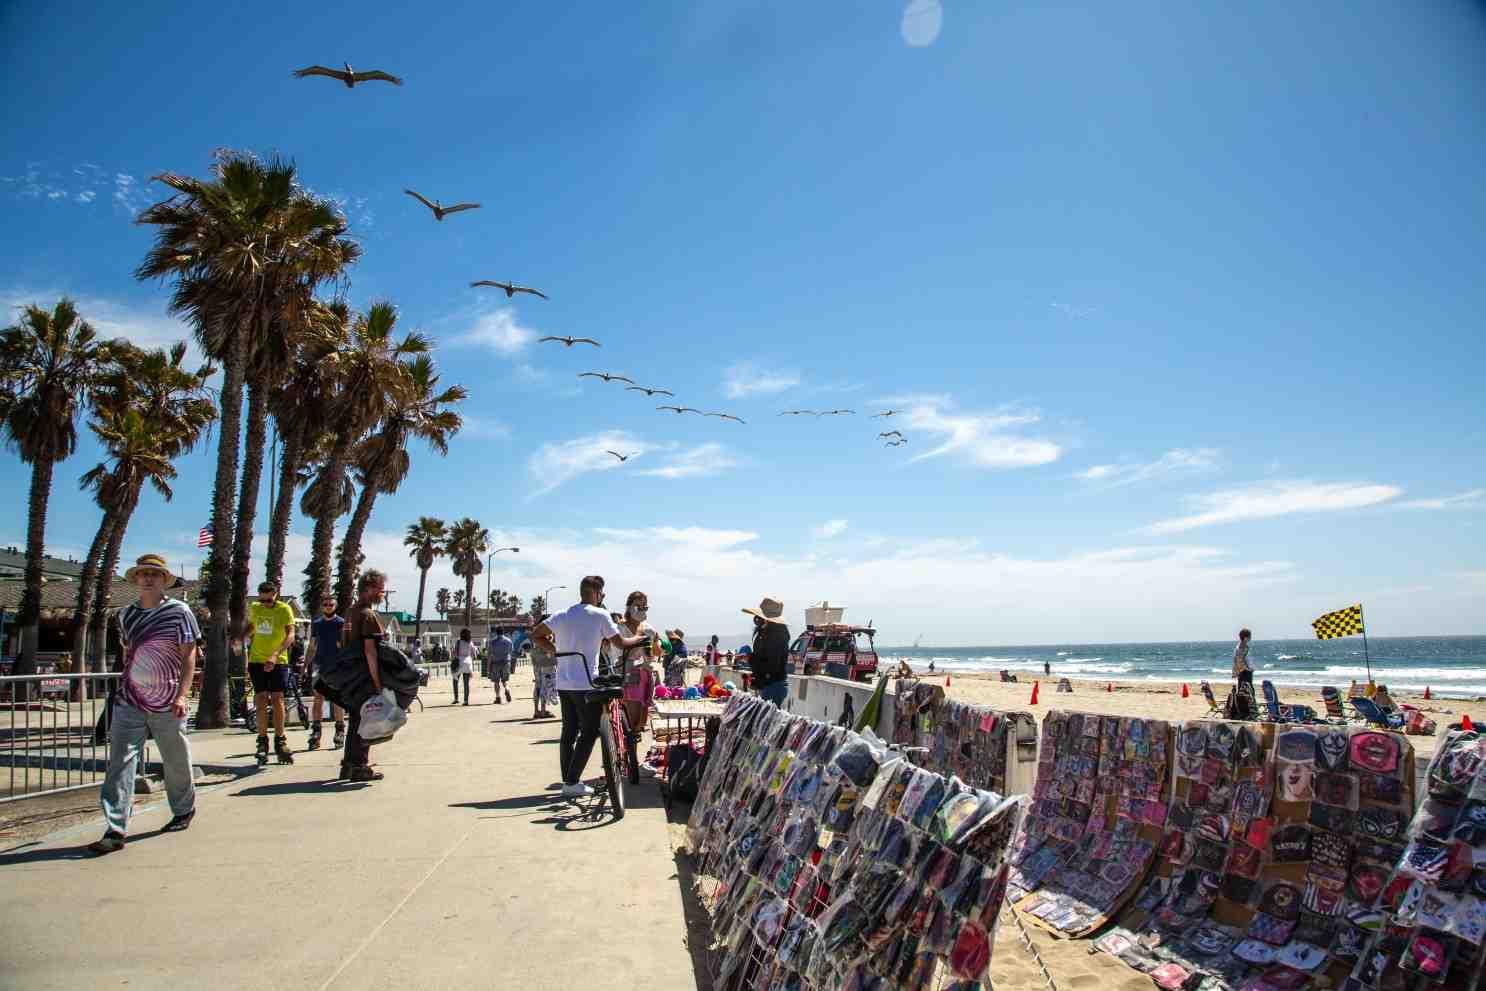 Is San Diego a dangerous city?